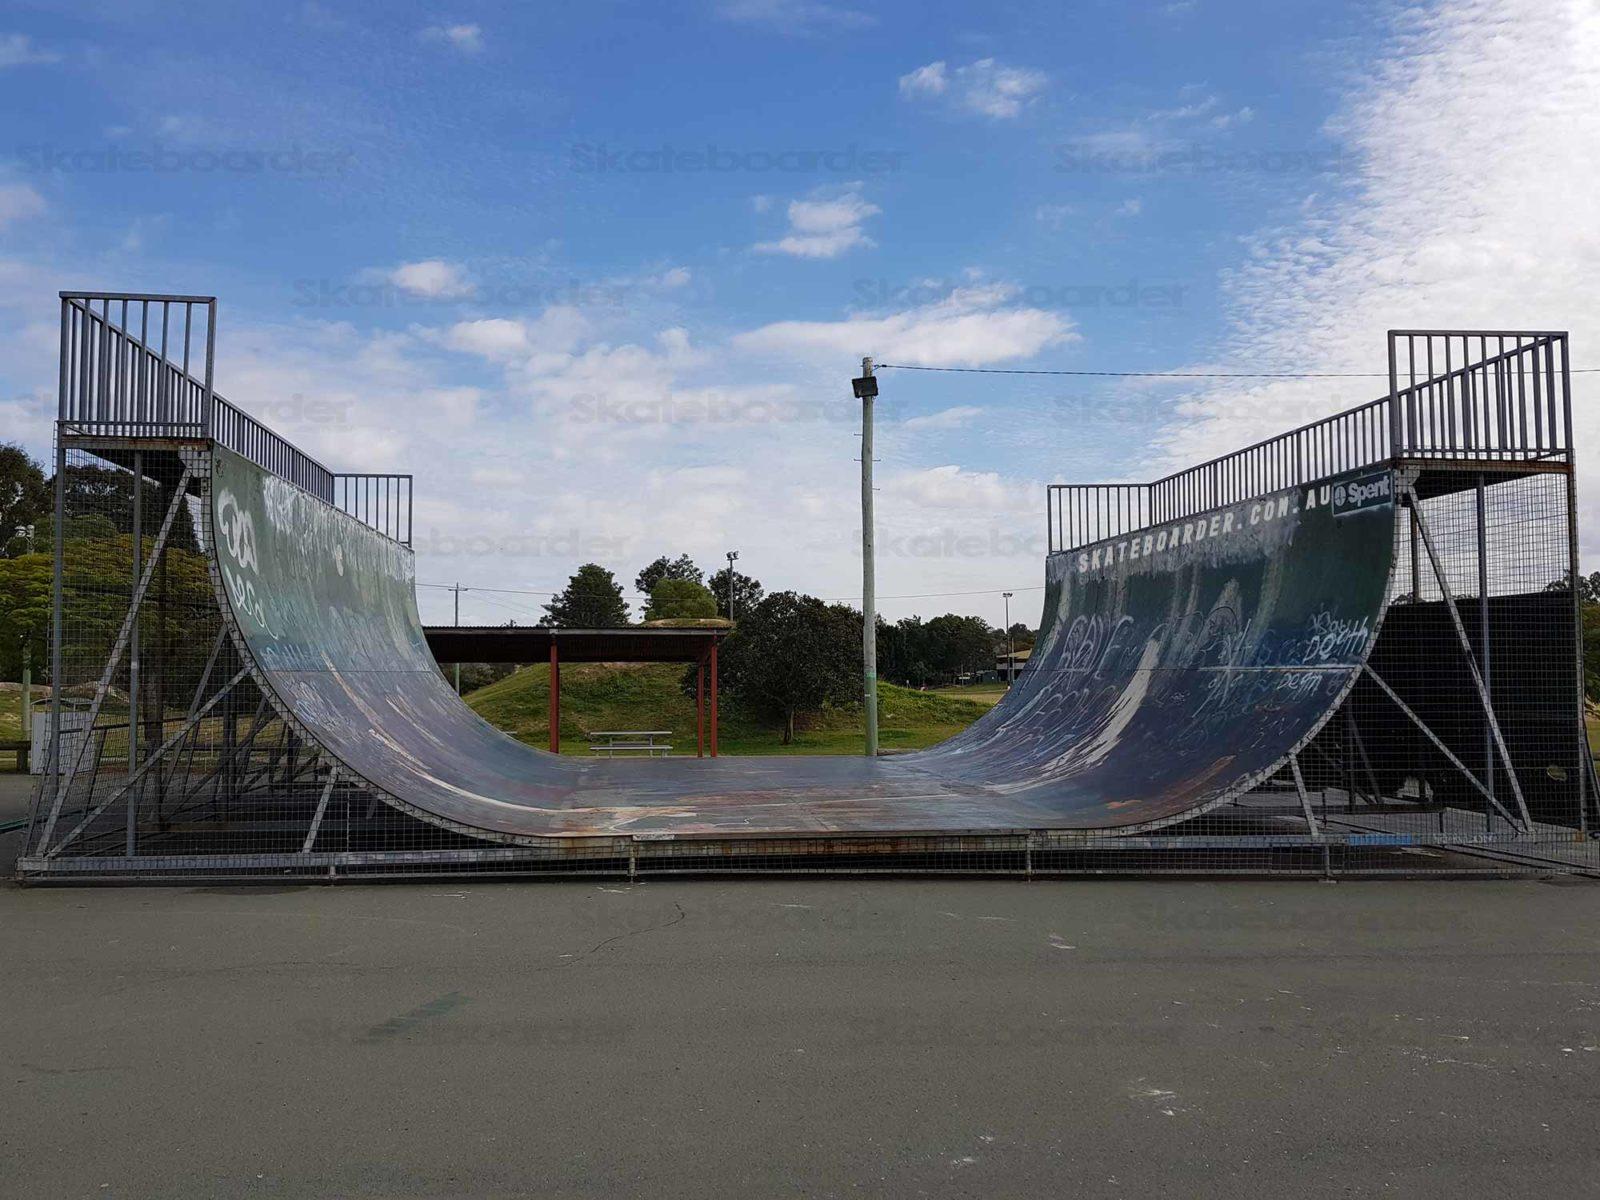 Beenleigh Skatepark Halfpipe